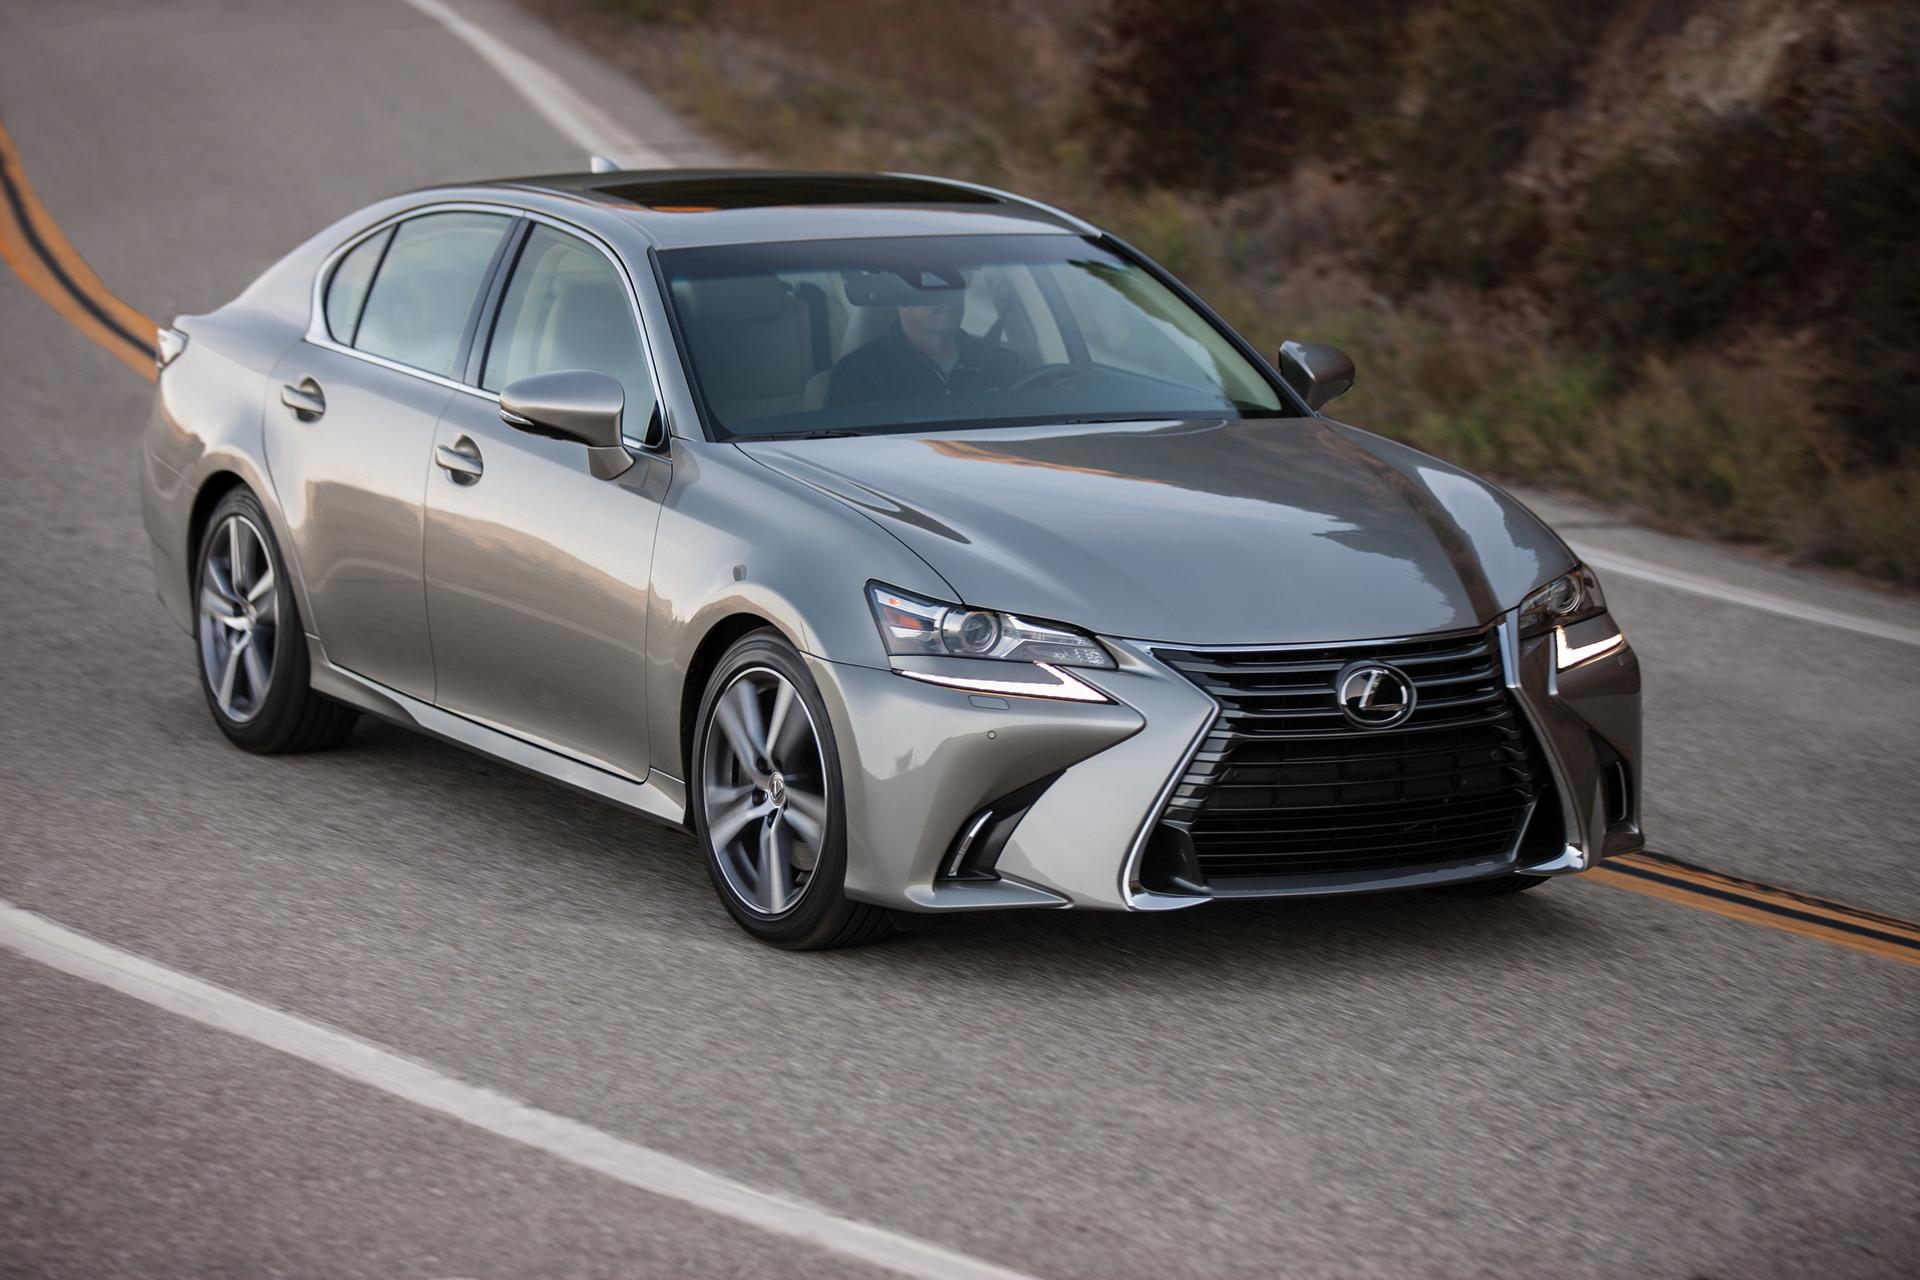 2016 Lexus GS 200t © Toyota Motor Corporation